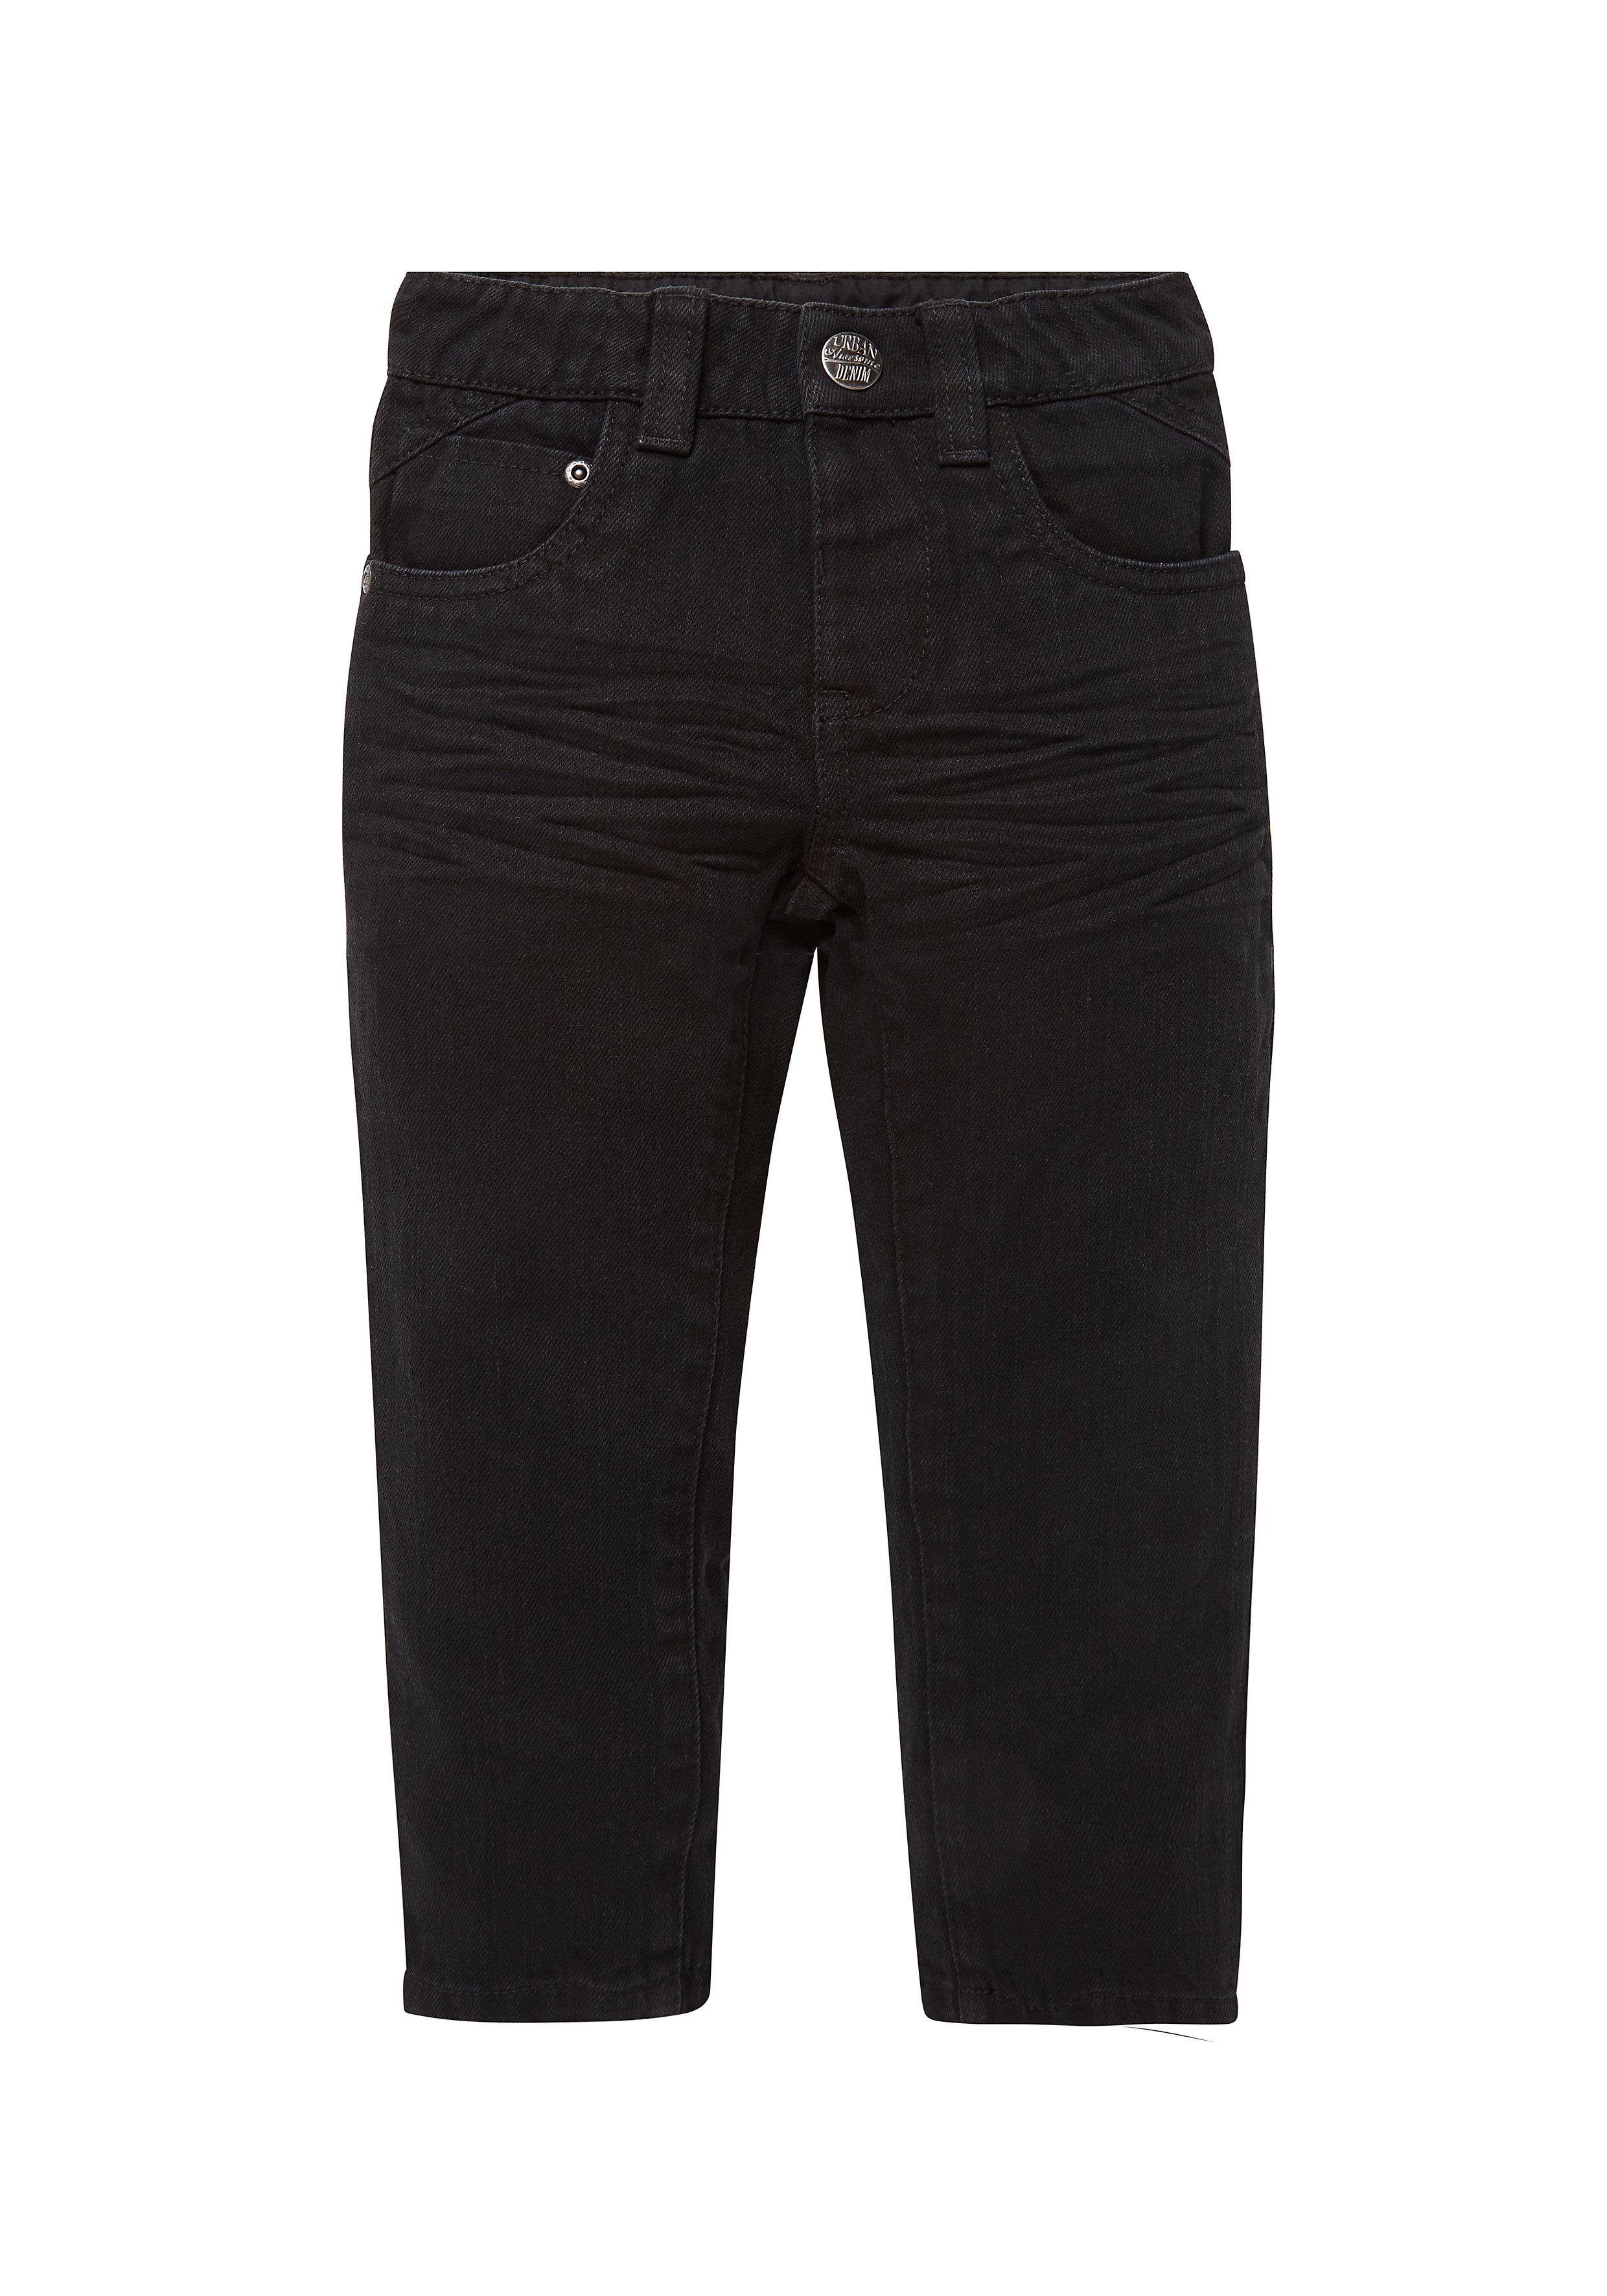 Mothercare | Boys Jeans - Black